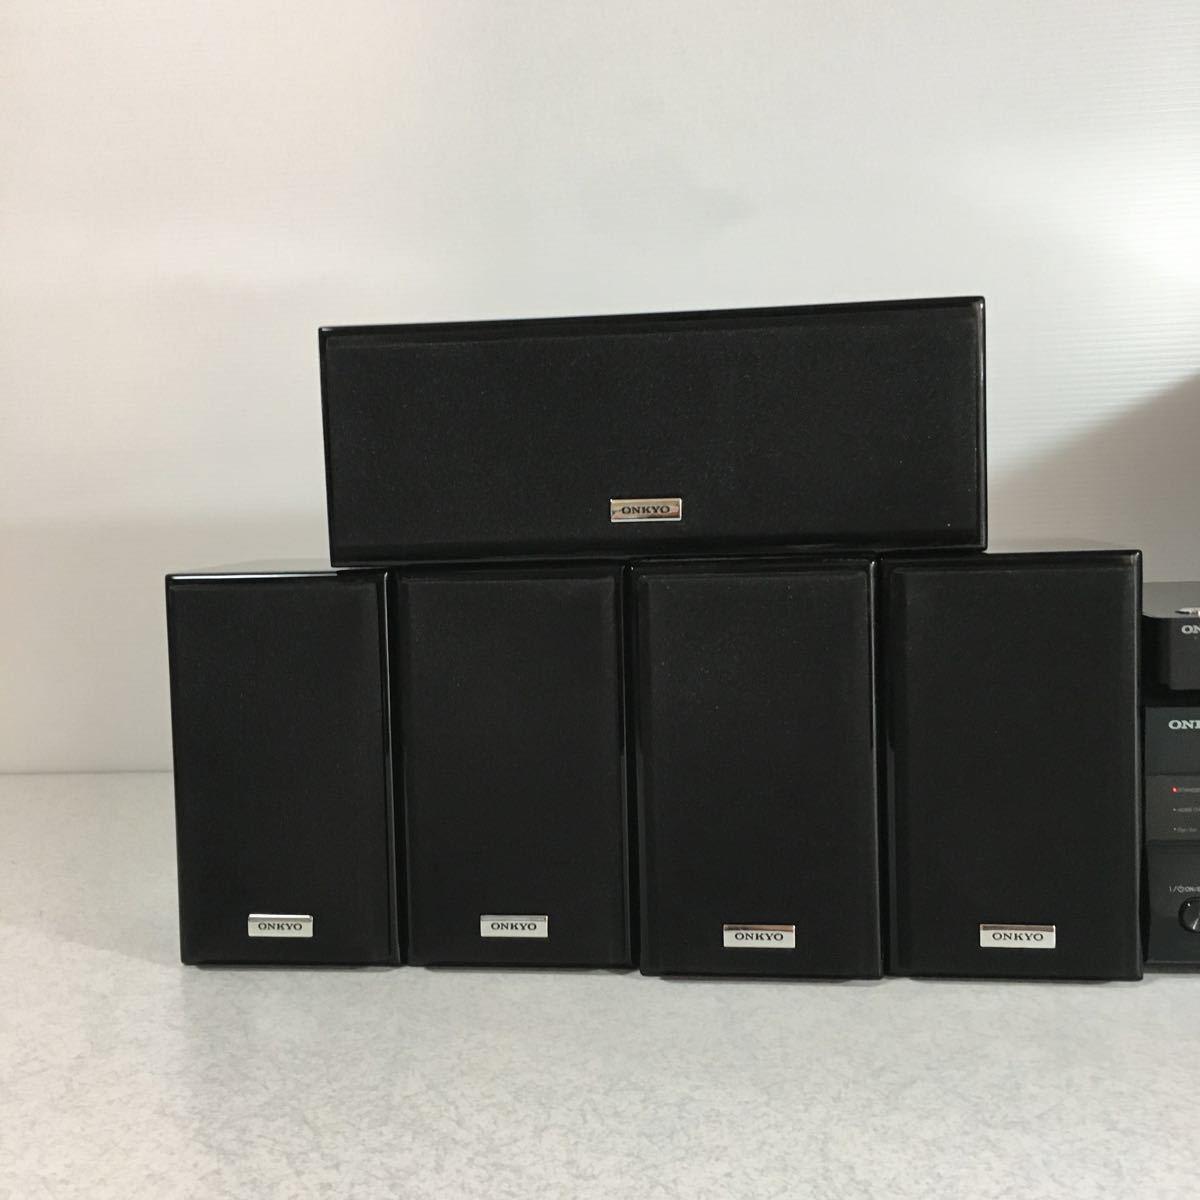 ONKYO オンキョー SA-205HDX ST-V30HDX SWA-V30HDX D-108M ND-S1 サラウンドセット リモコン付き_画像2